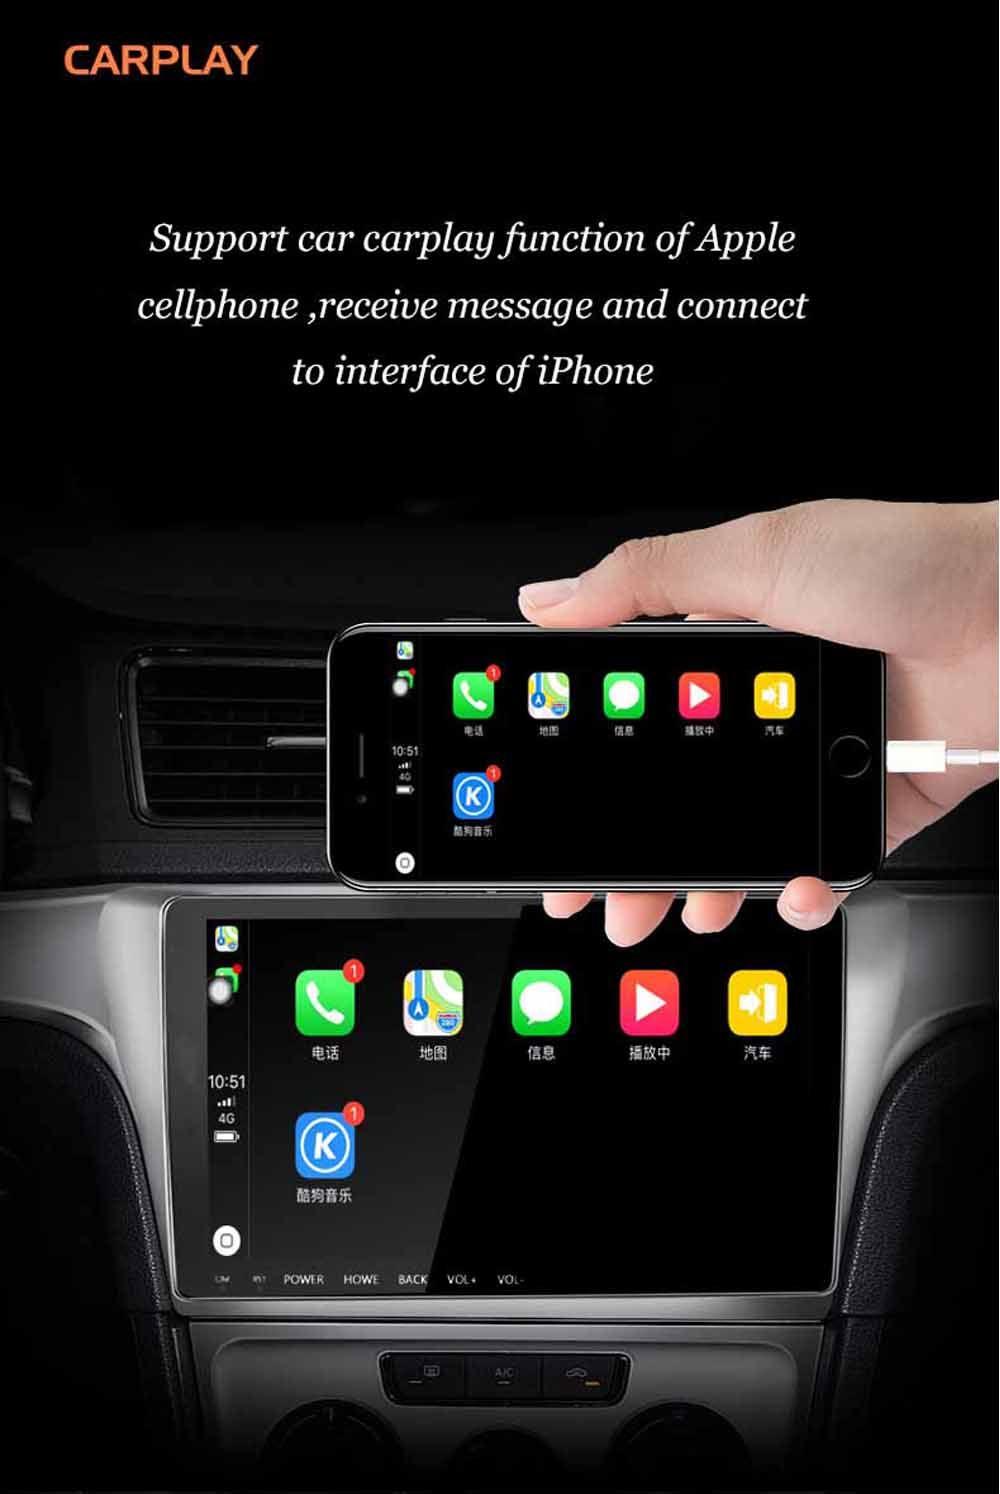 9 7 Tesla Android Car Stereo Radio Audio Dvd Gps Navigation Head Unit Sat Nav Infotainment Replacement Satnav For Infiniti Fx25 Fx35 F37 2003 2004 2005 2006 20 In 2020 Android Car Stereo Gps Navigation Car Stereo